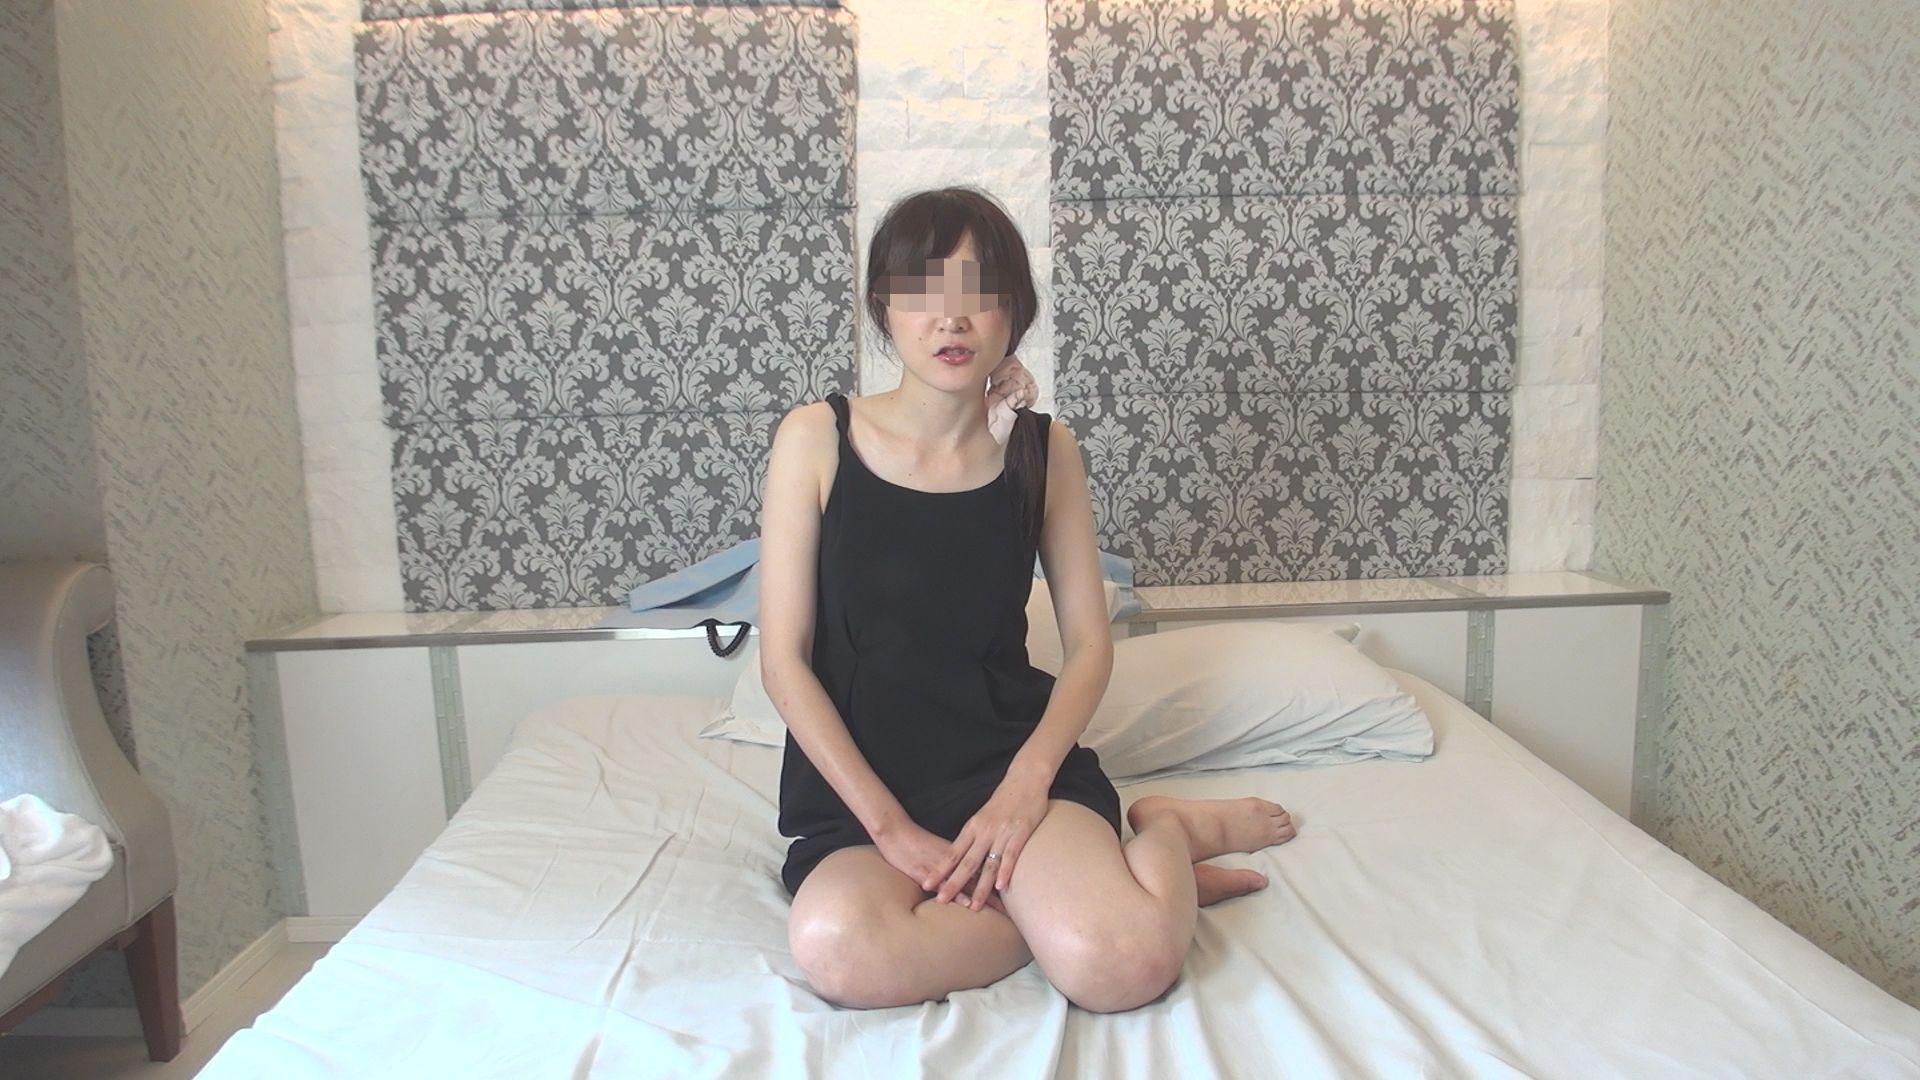 FC2 PPV 1221334 不倫主婦の性告白ドキュメンタリー【杉〇区役所勤務のペットをハメまくり中出し】「今日は平日。区役所休んでセックスしてるなんて最低よね」 【個人撮影】高画質ZIP付き